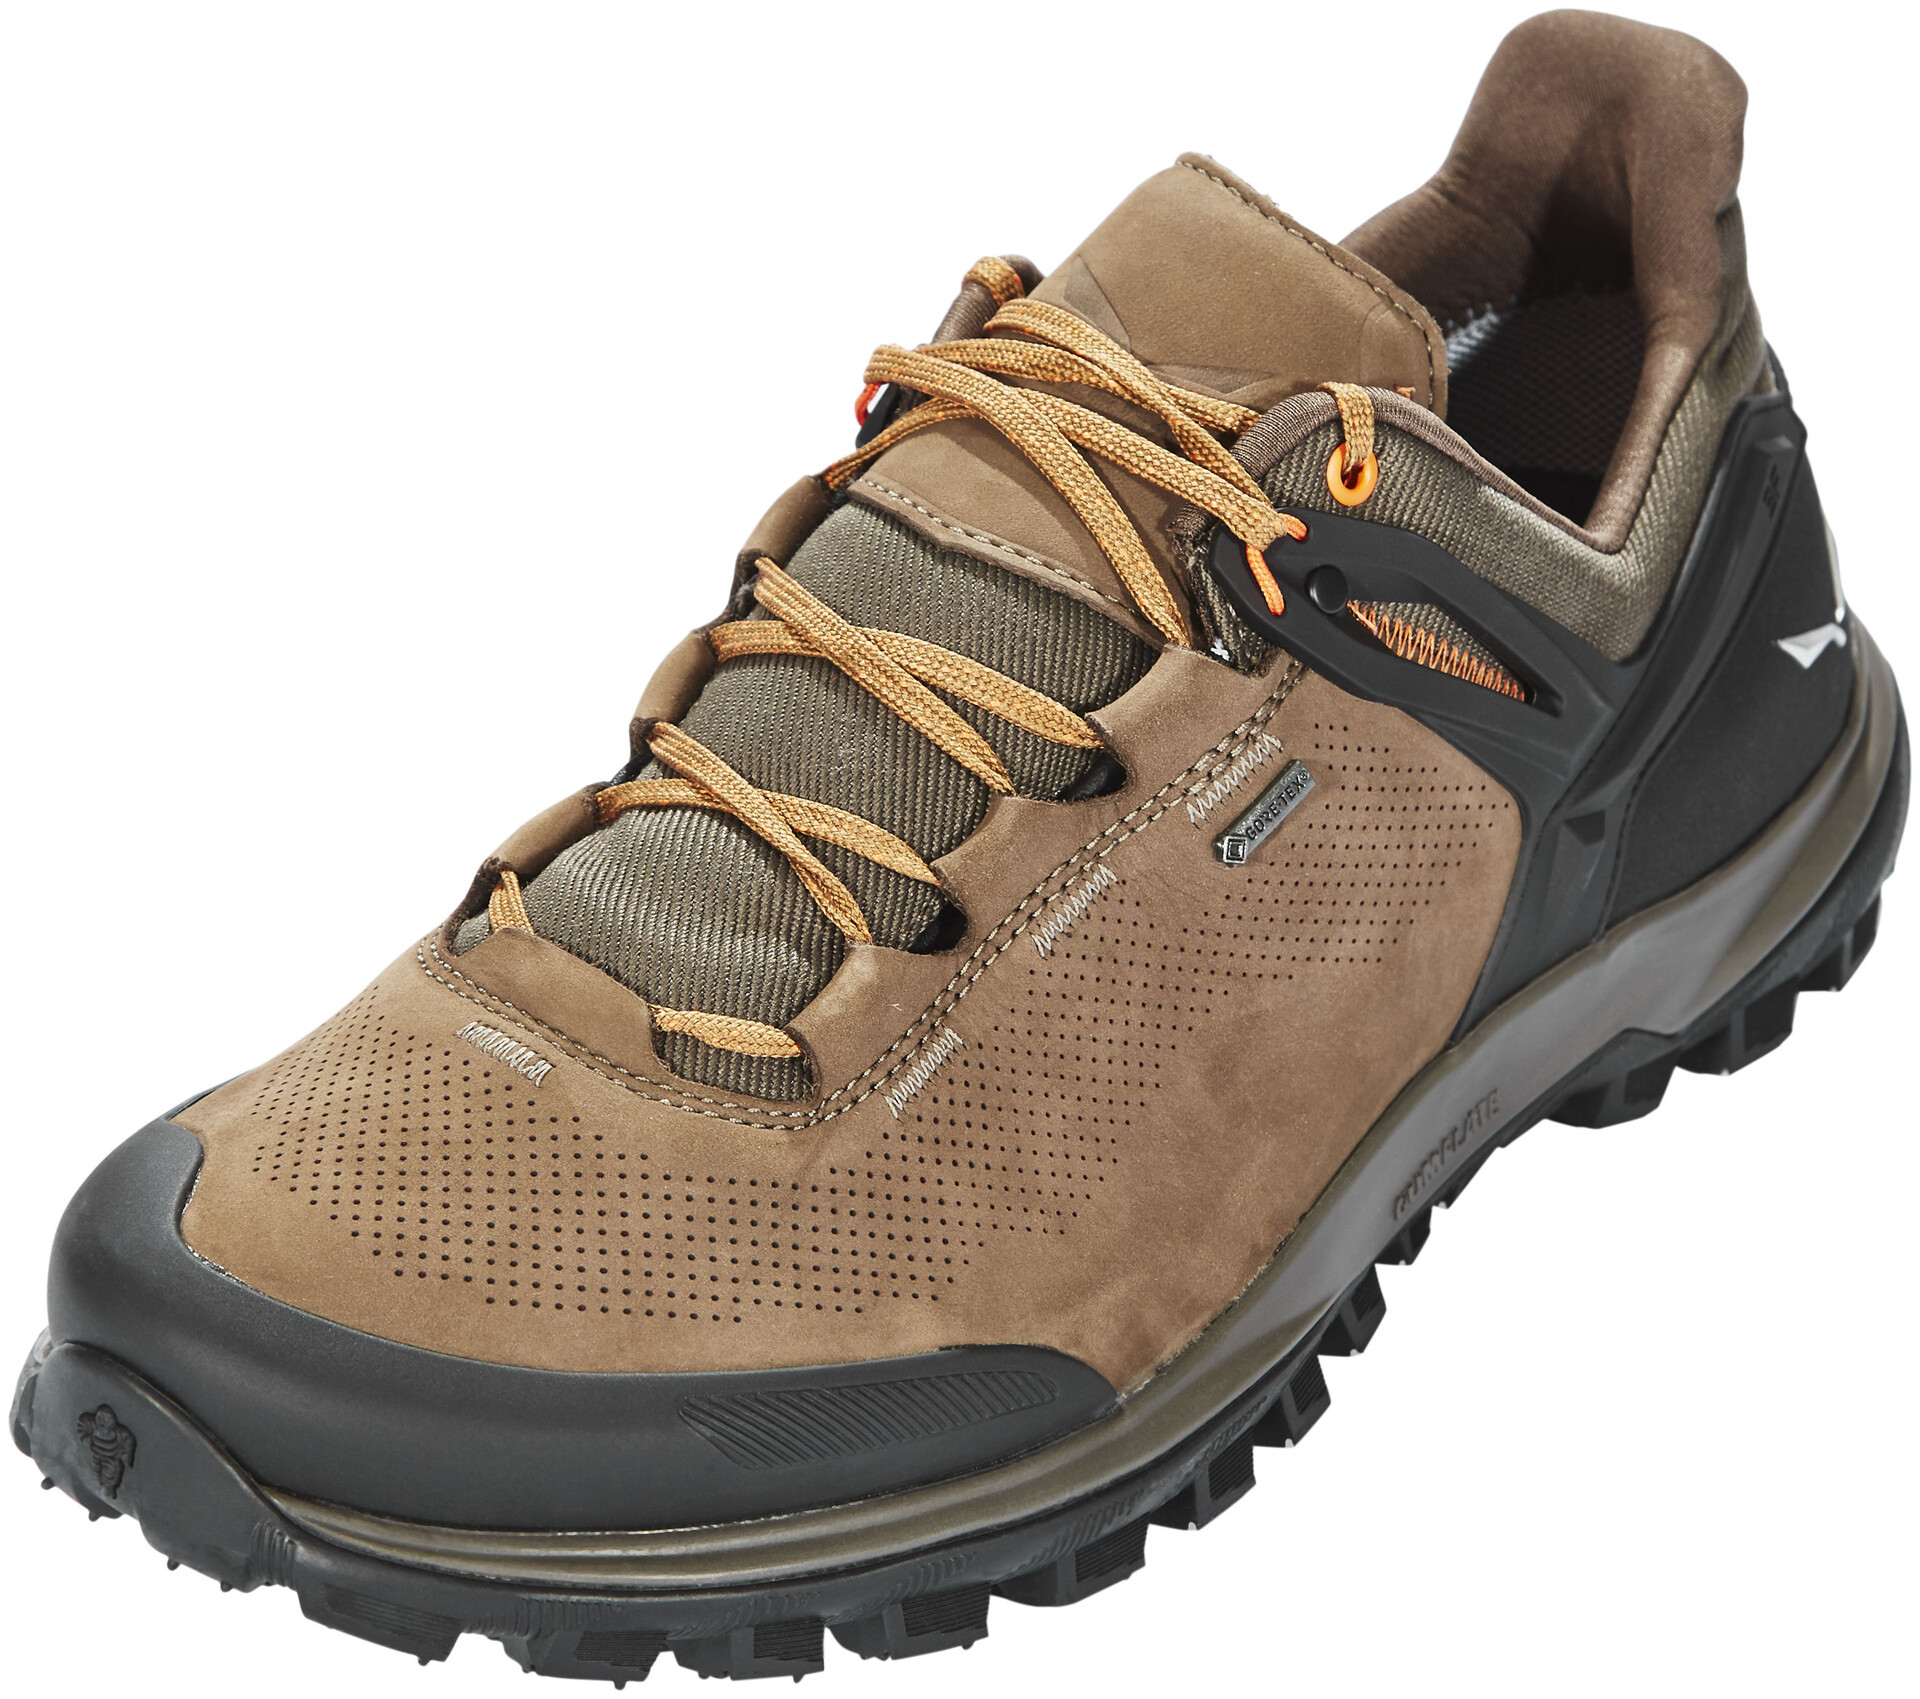 SALEWA Wander Hiker GTX |